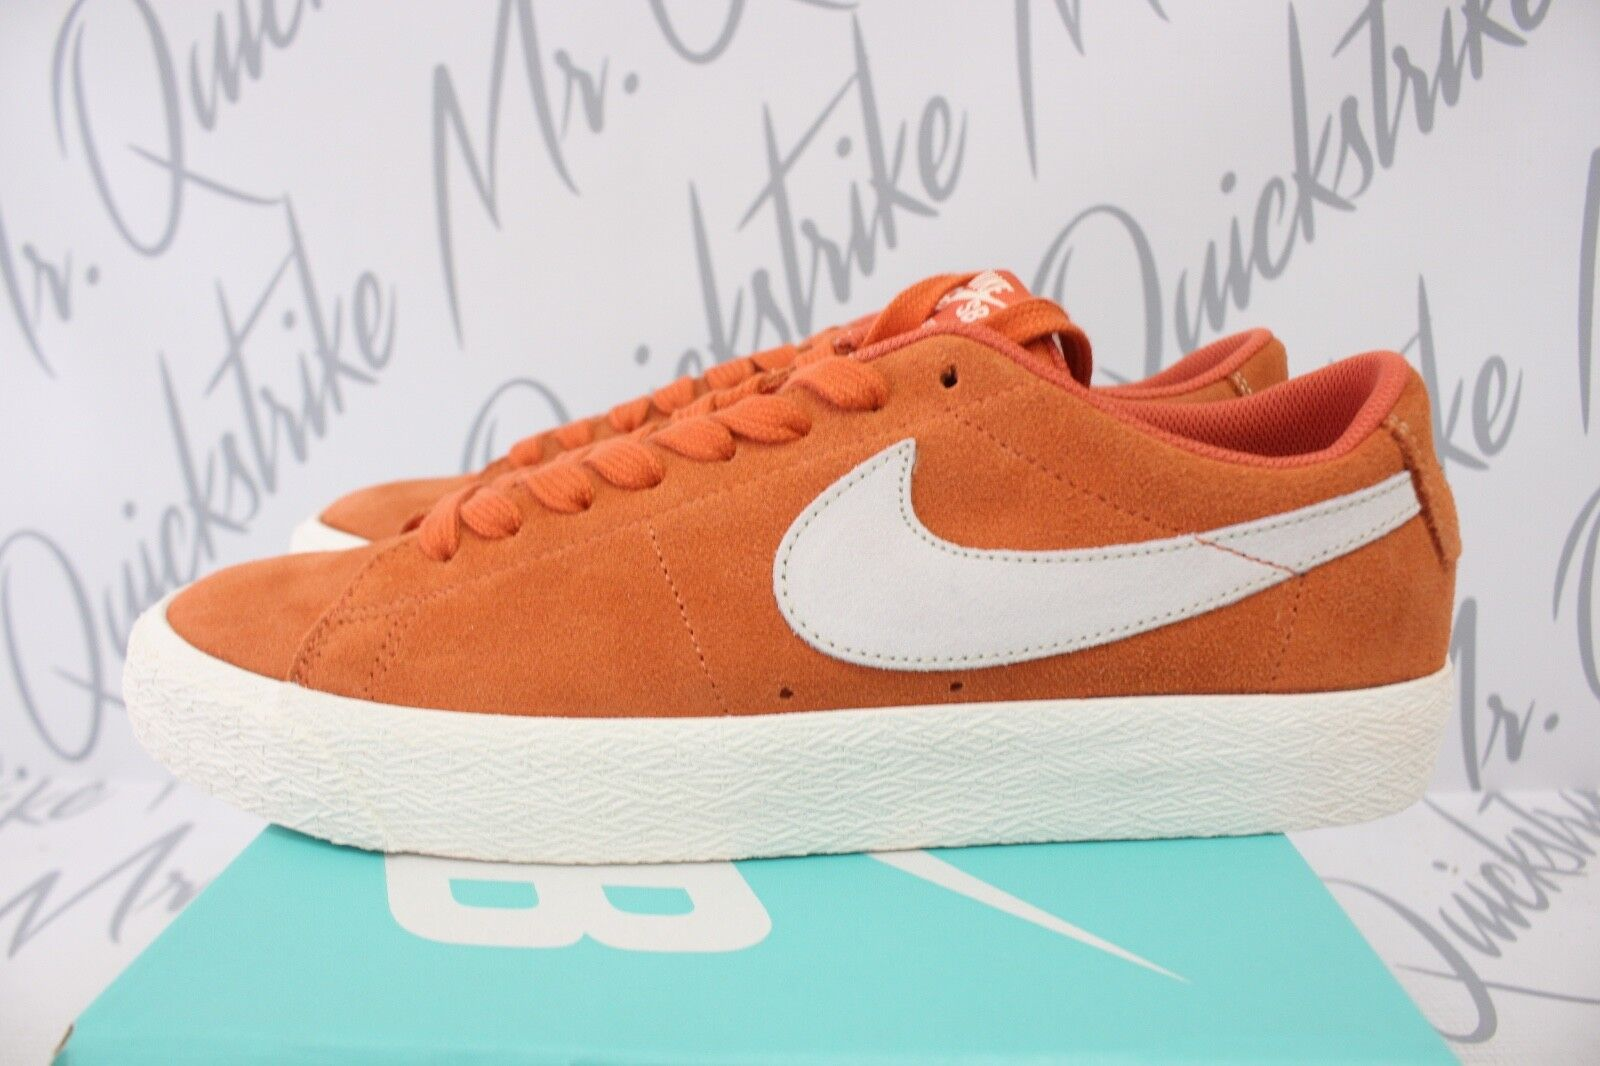 Nike Blazer Baja Sb Vintage 864347 Coral Vela Fossil Blanco 864347 Vintage 800 b9ff0b